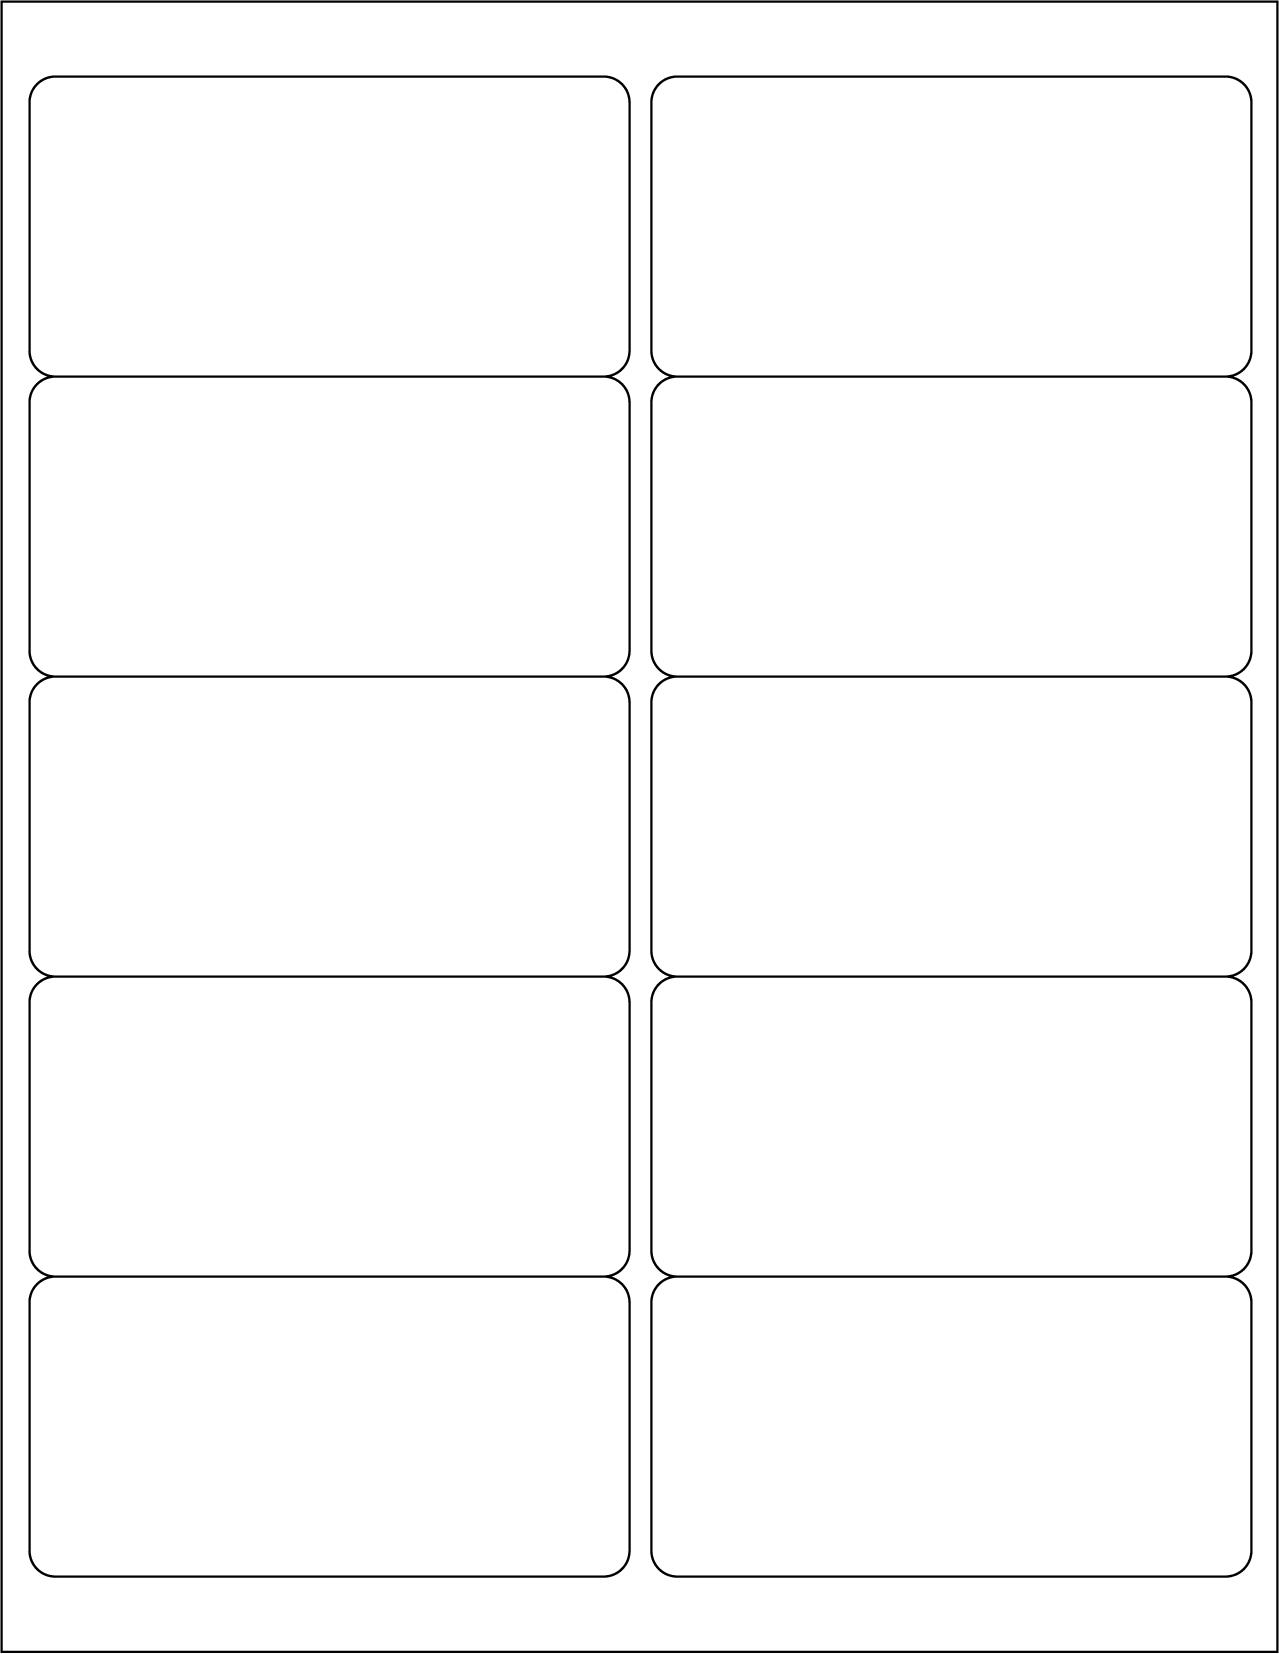 13 Design Free Printable Label Template Word Images - Free Printable - Free Printable Label Templates For Word